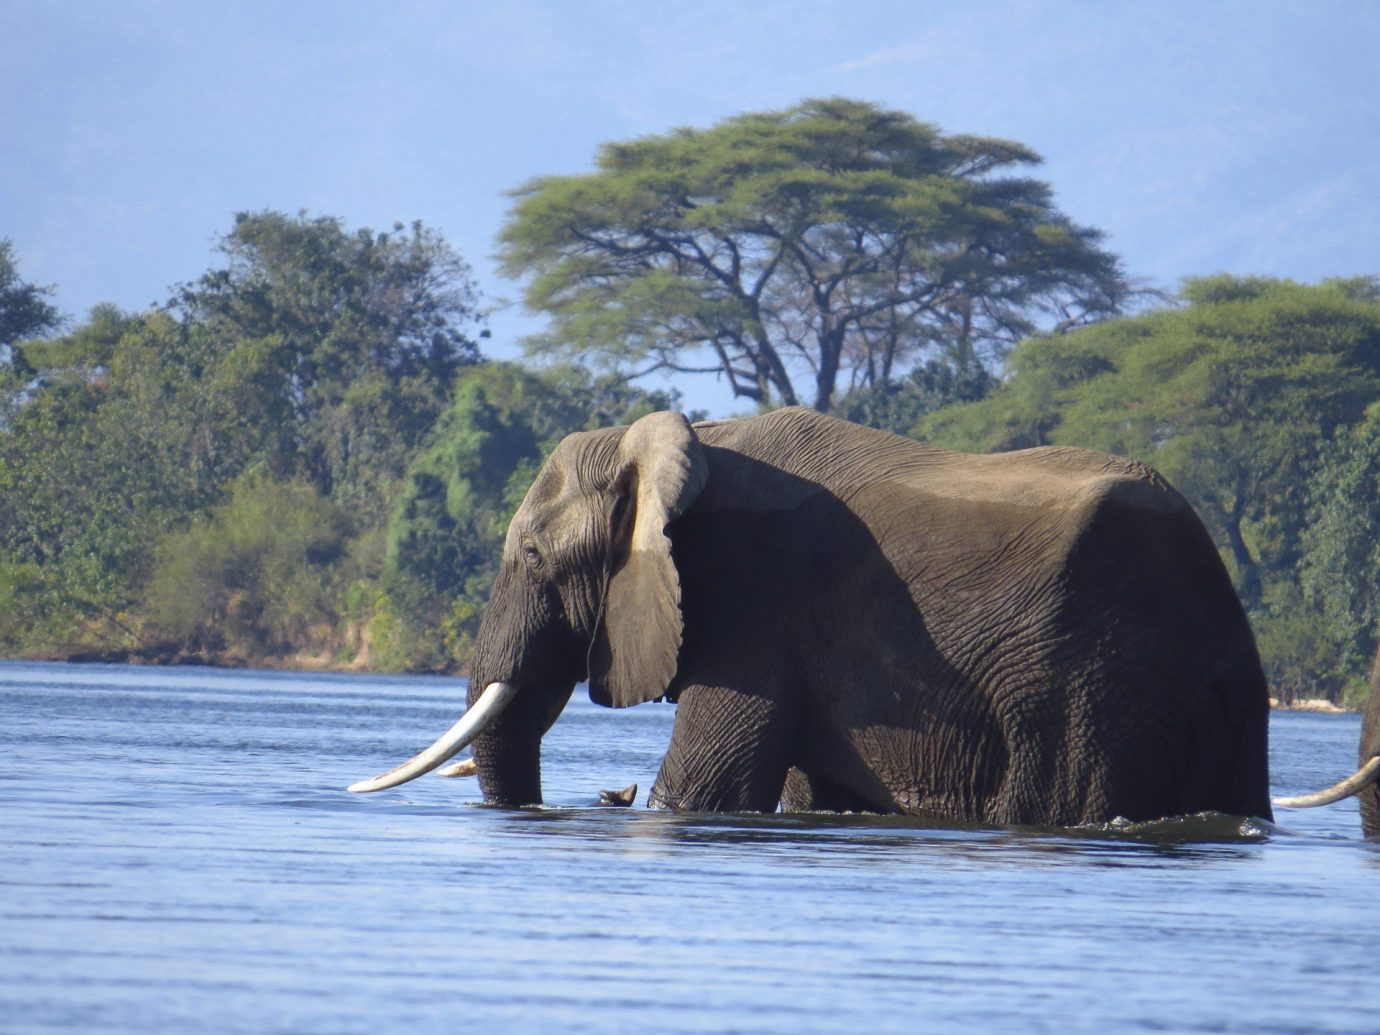 Offbeat elephant tree outdoor water animal sky indian elephant mammal elephants and mammoths fauna Wildlife River Lake african elephant Safari trunk